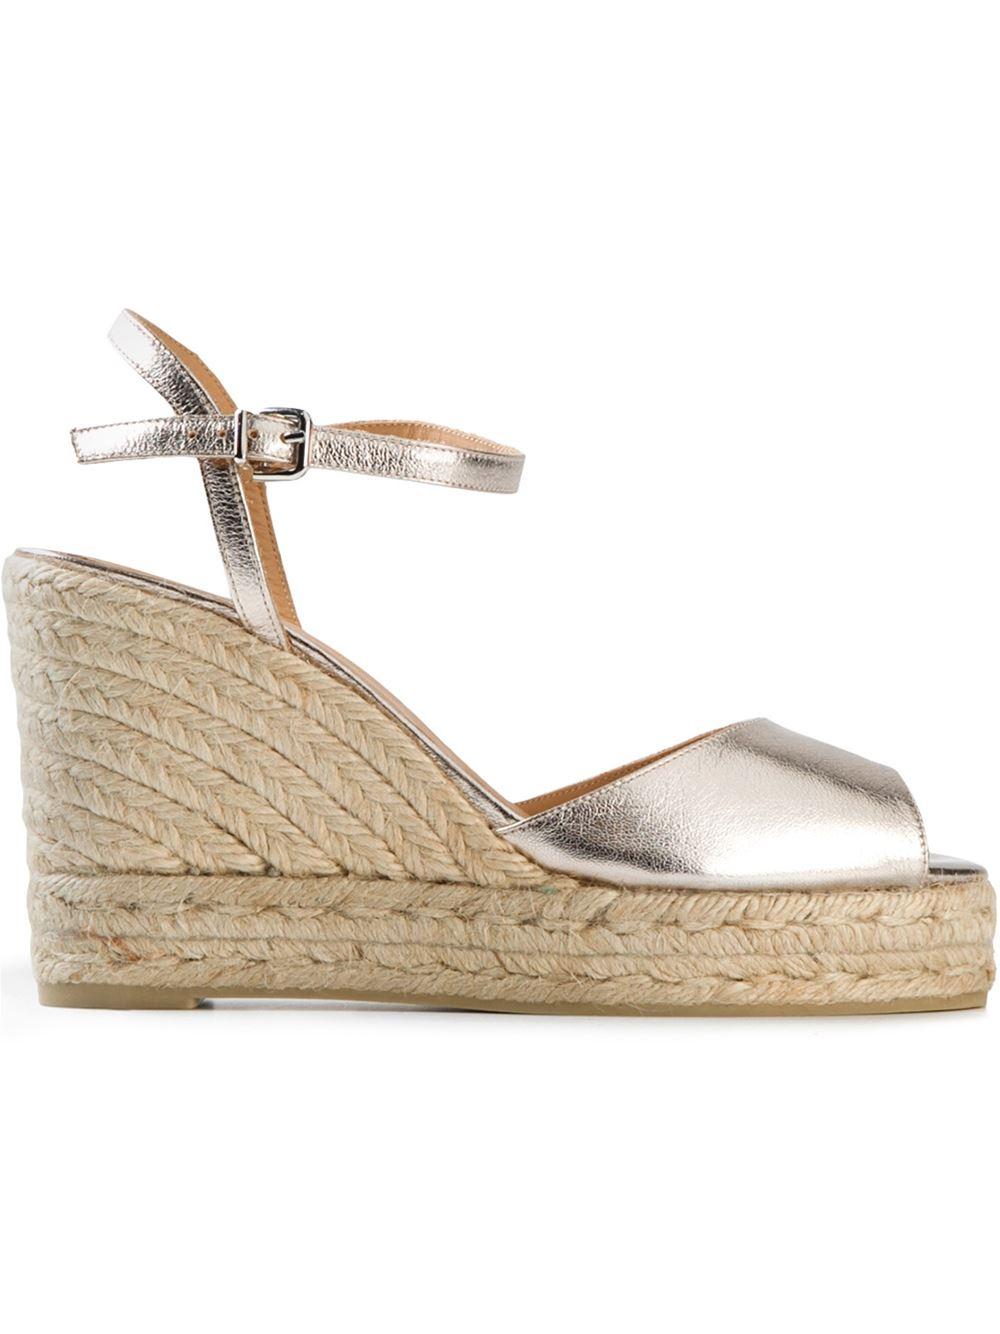 e41bcfca83f Castaner Metallic 'Audrey' Espadrille Wedge Sandals